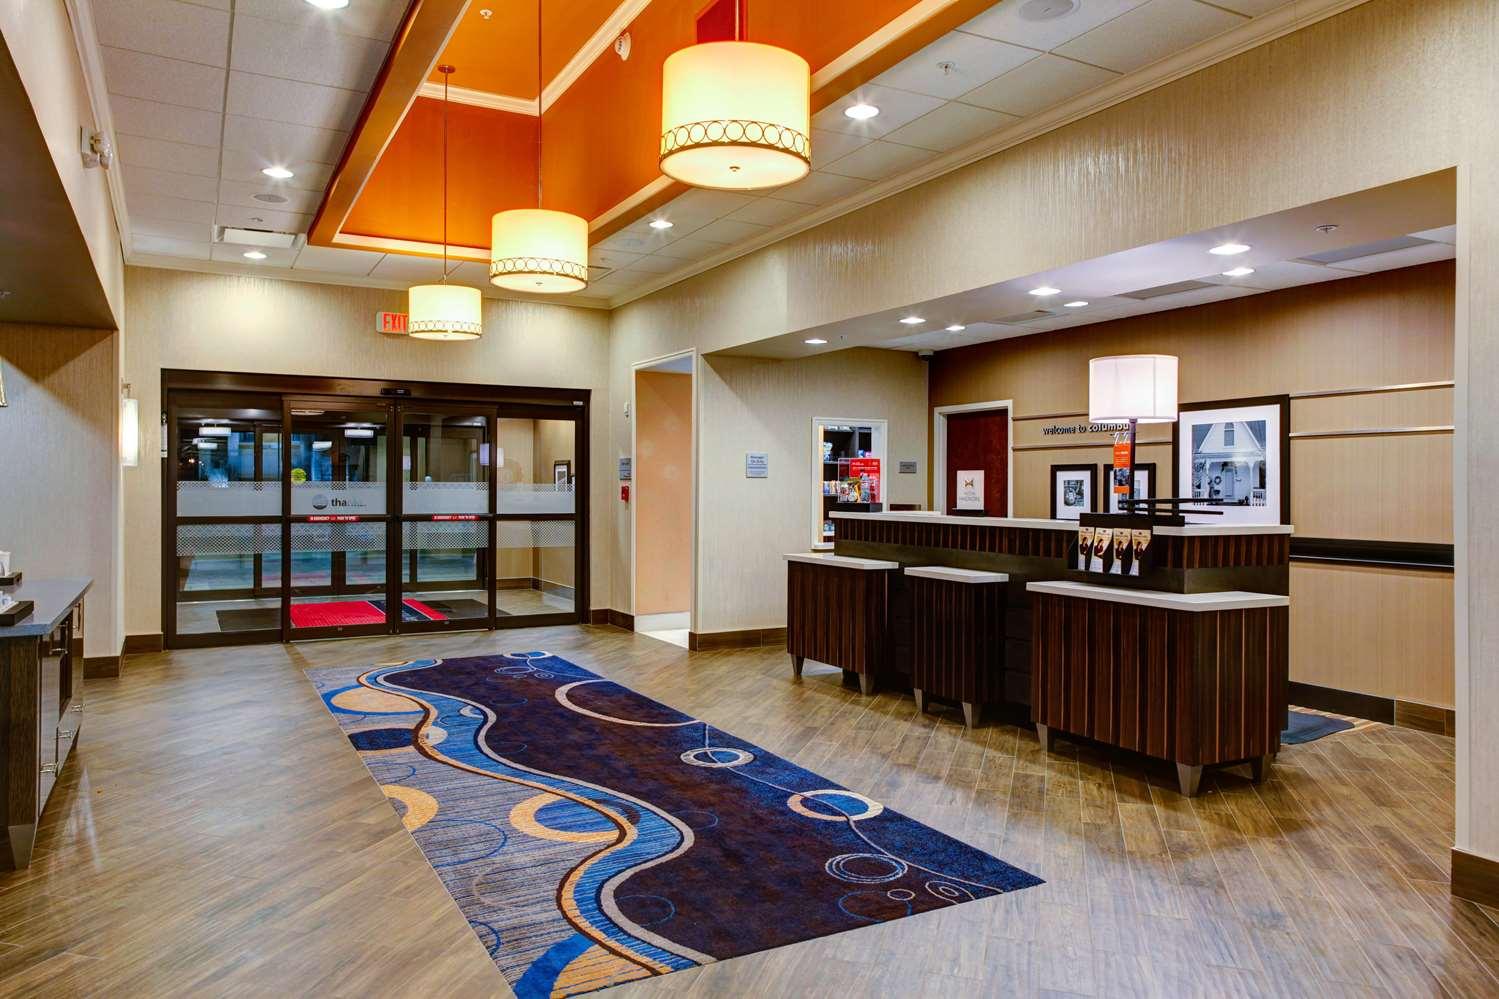 Hampton Inn and Suites Columbus MS